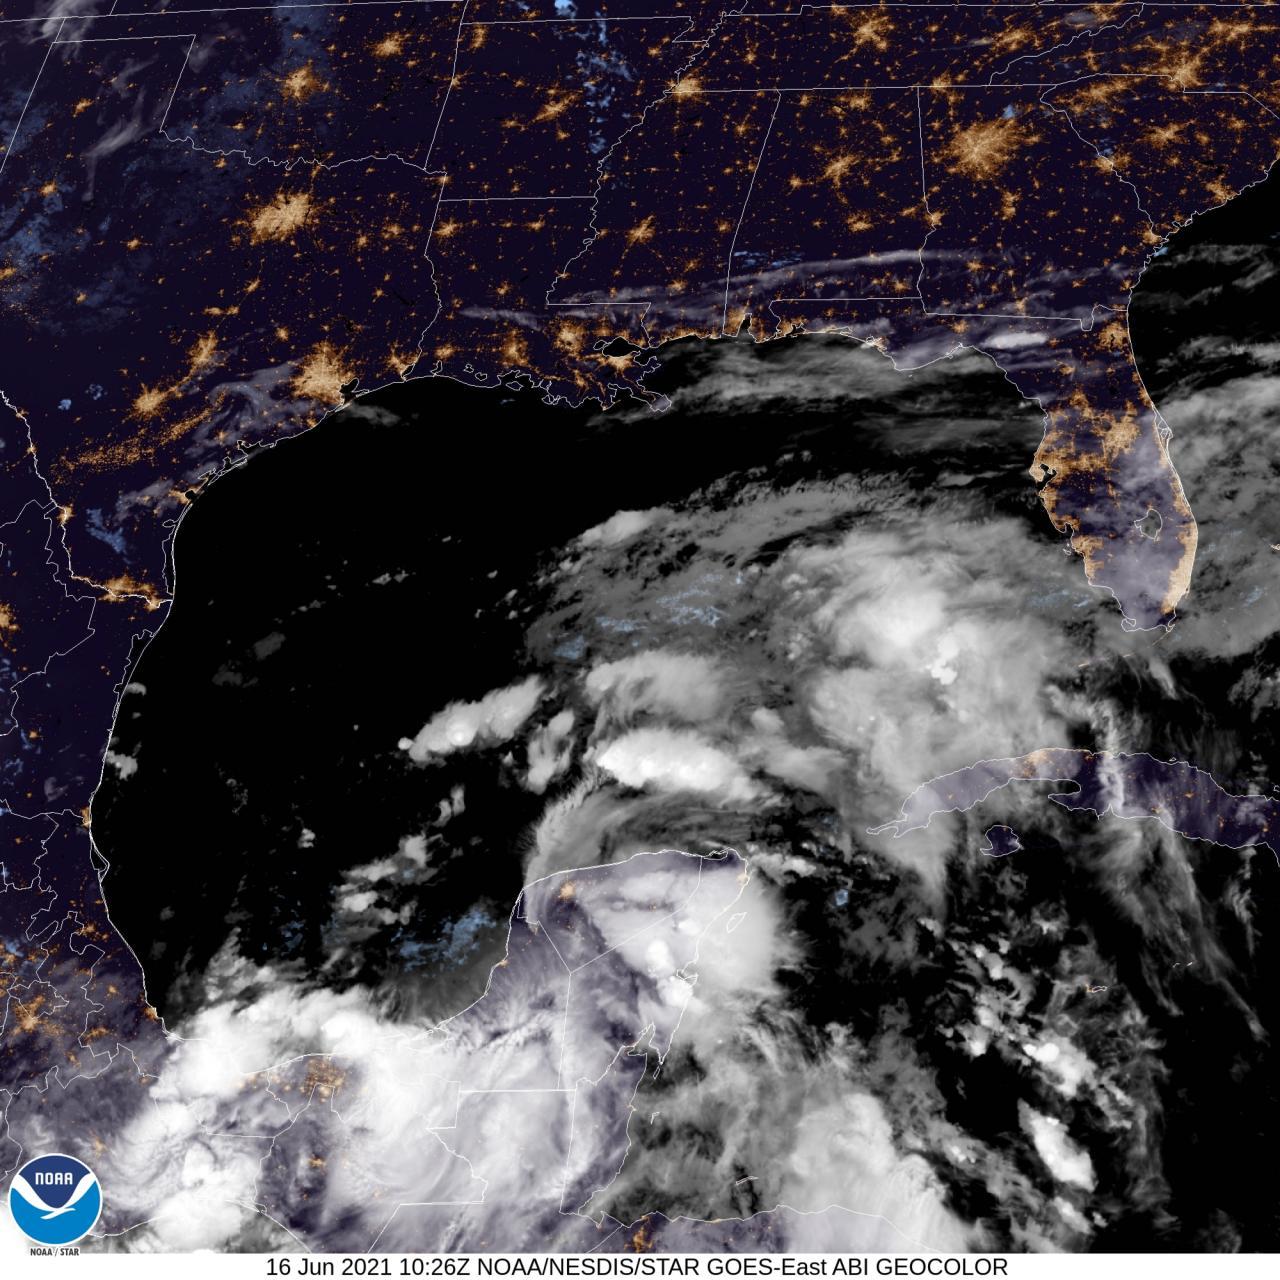 Immagine satellite mercoledì Golfo del Messico (Fonte: NOAA)